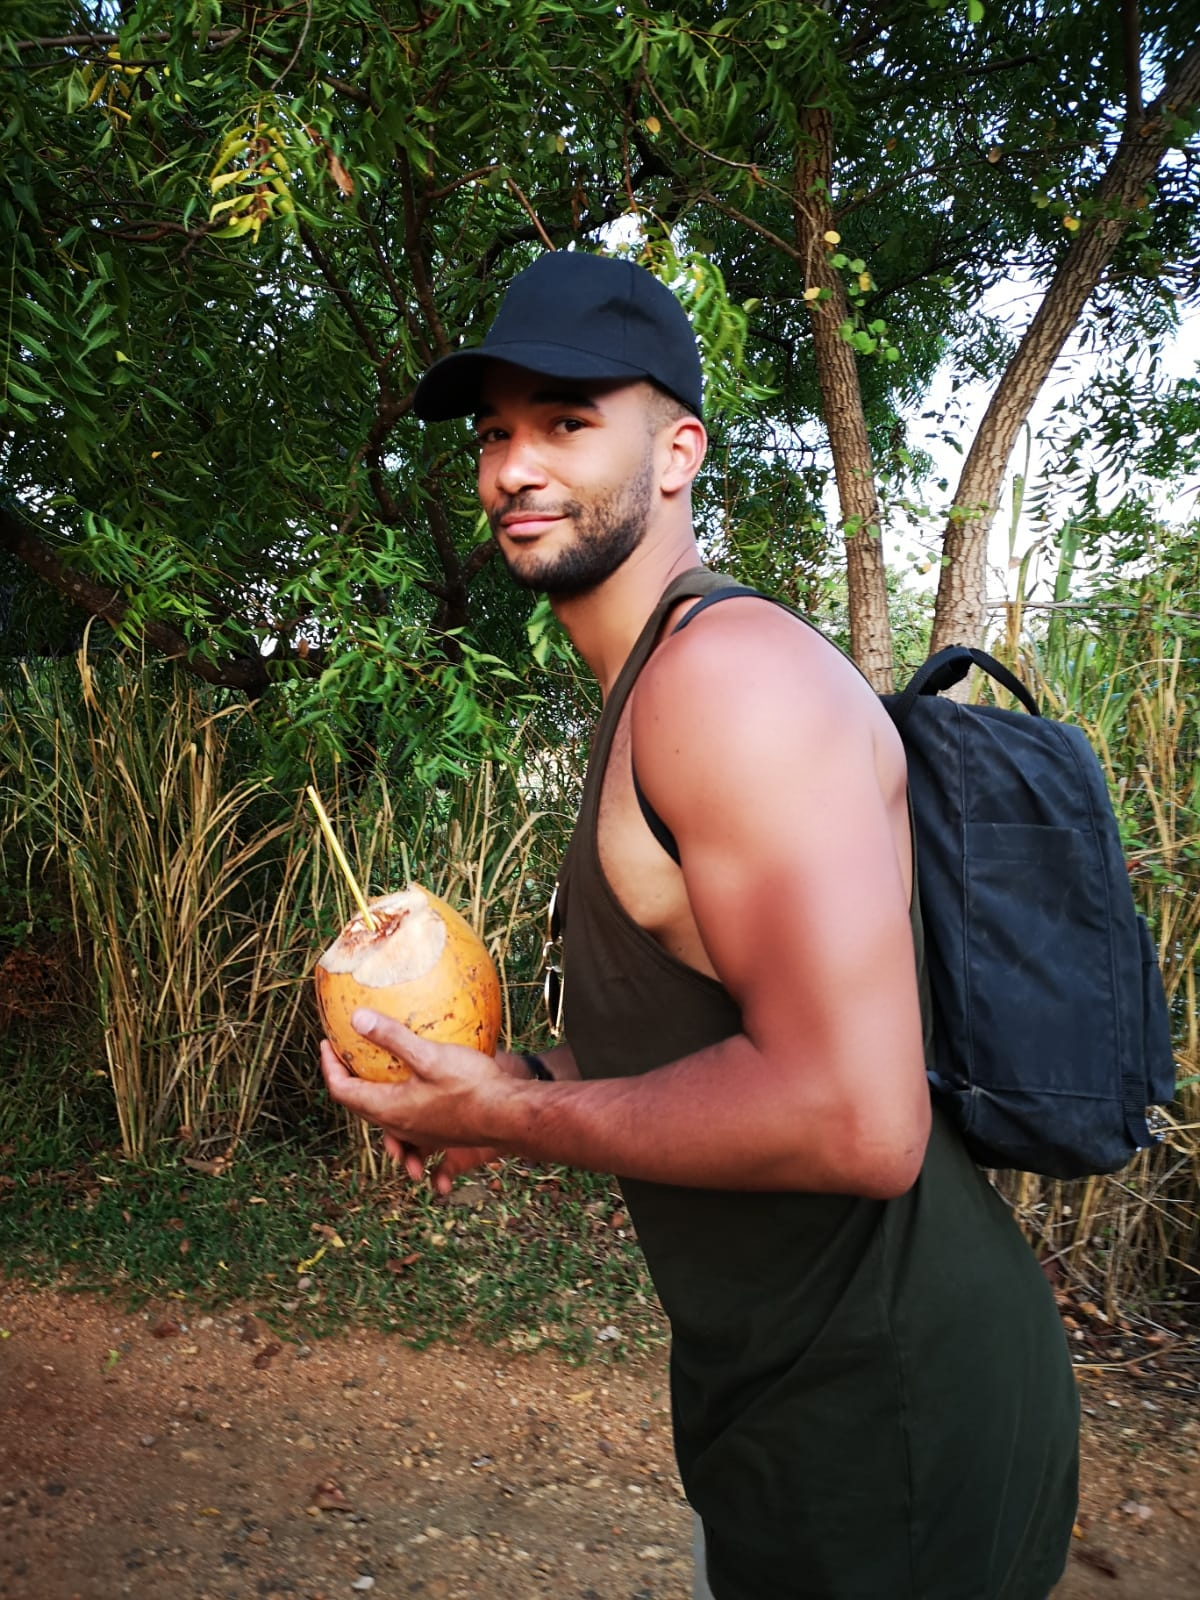 invite-to-paradise-sri-lanka-holiday-honeymoon-specialists-customer-feedback-elin-jordan-luce-trekking-king-coconut.JPG